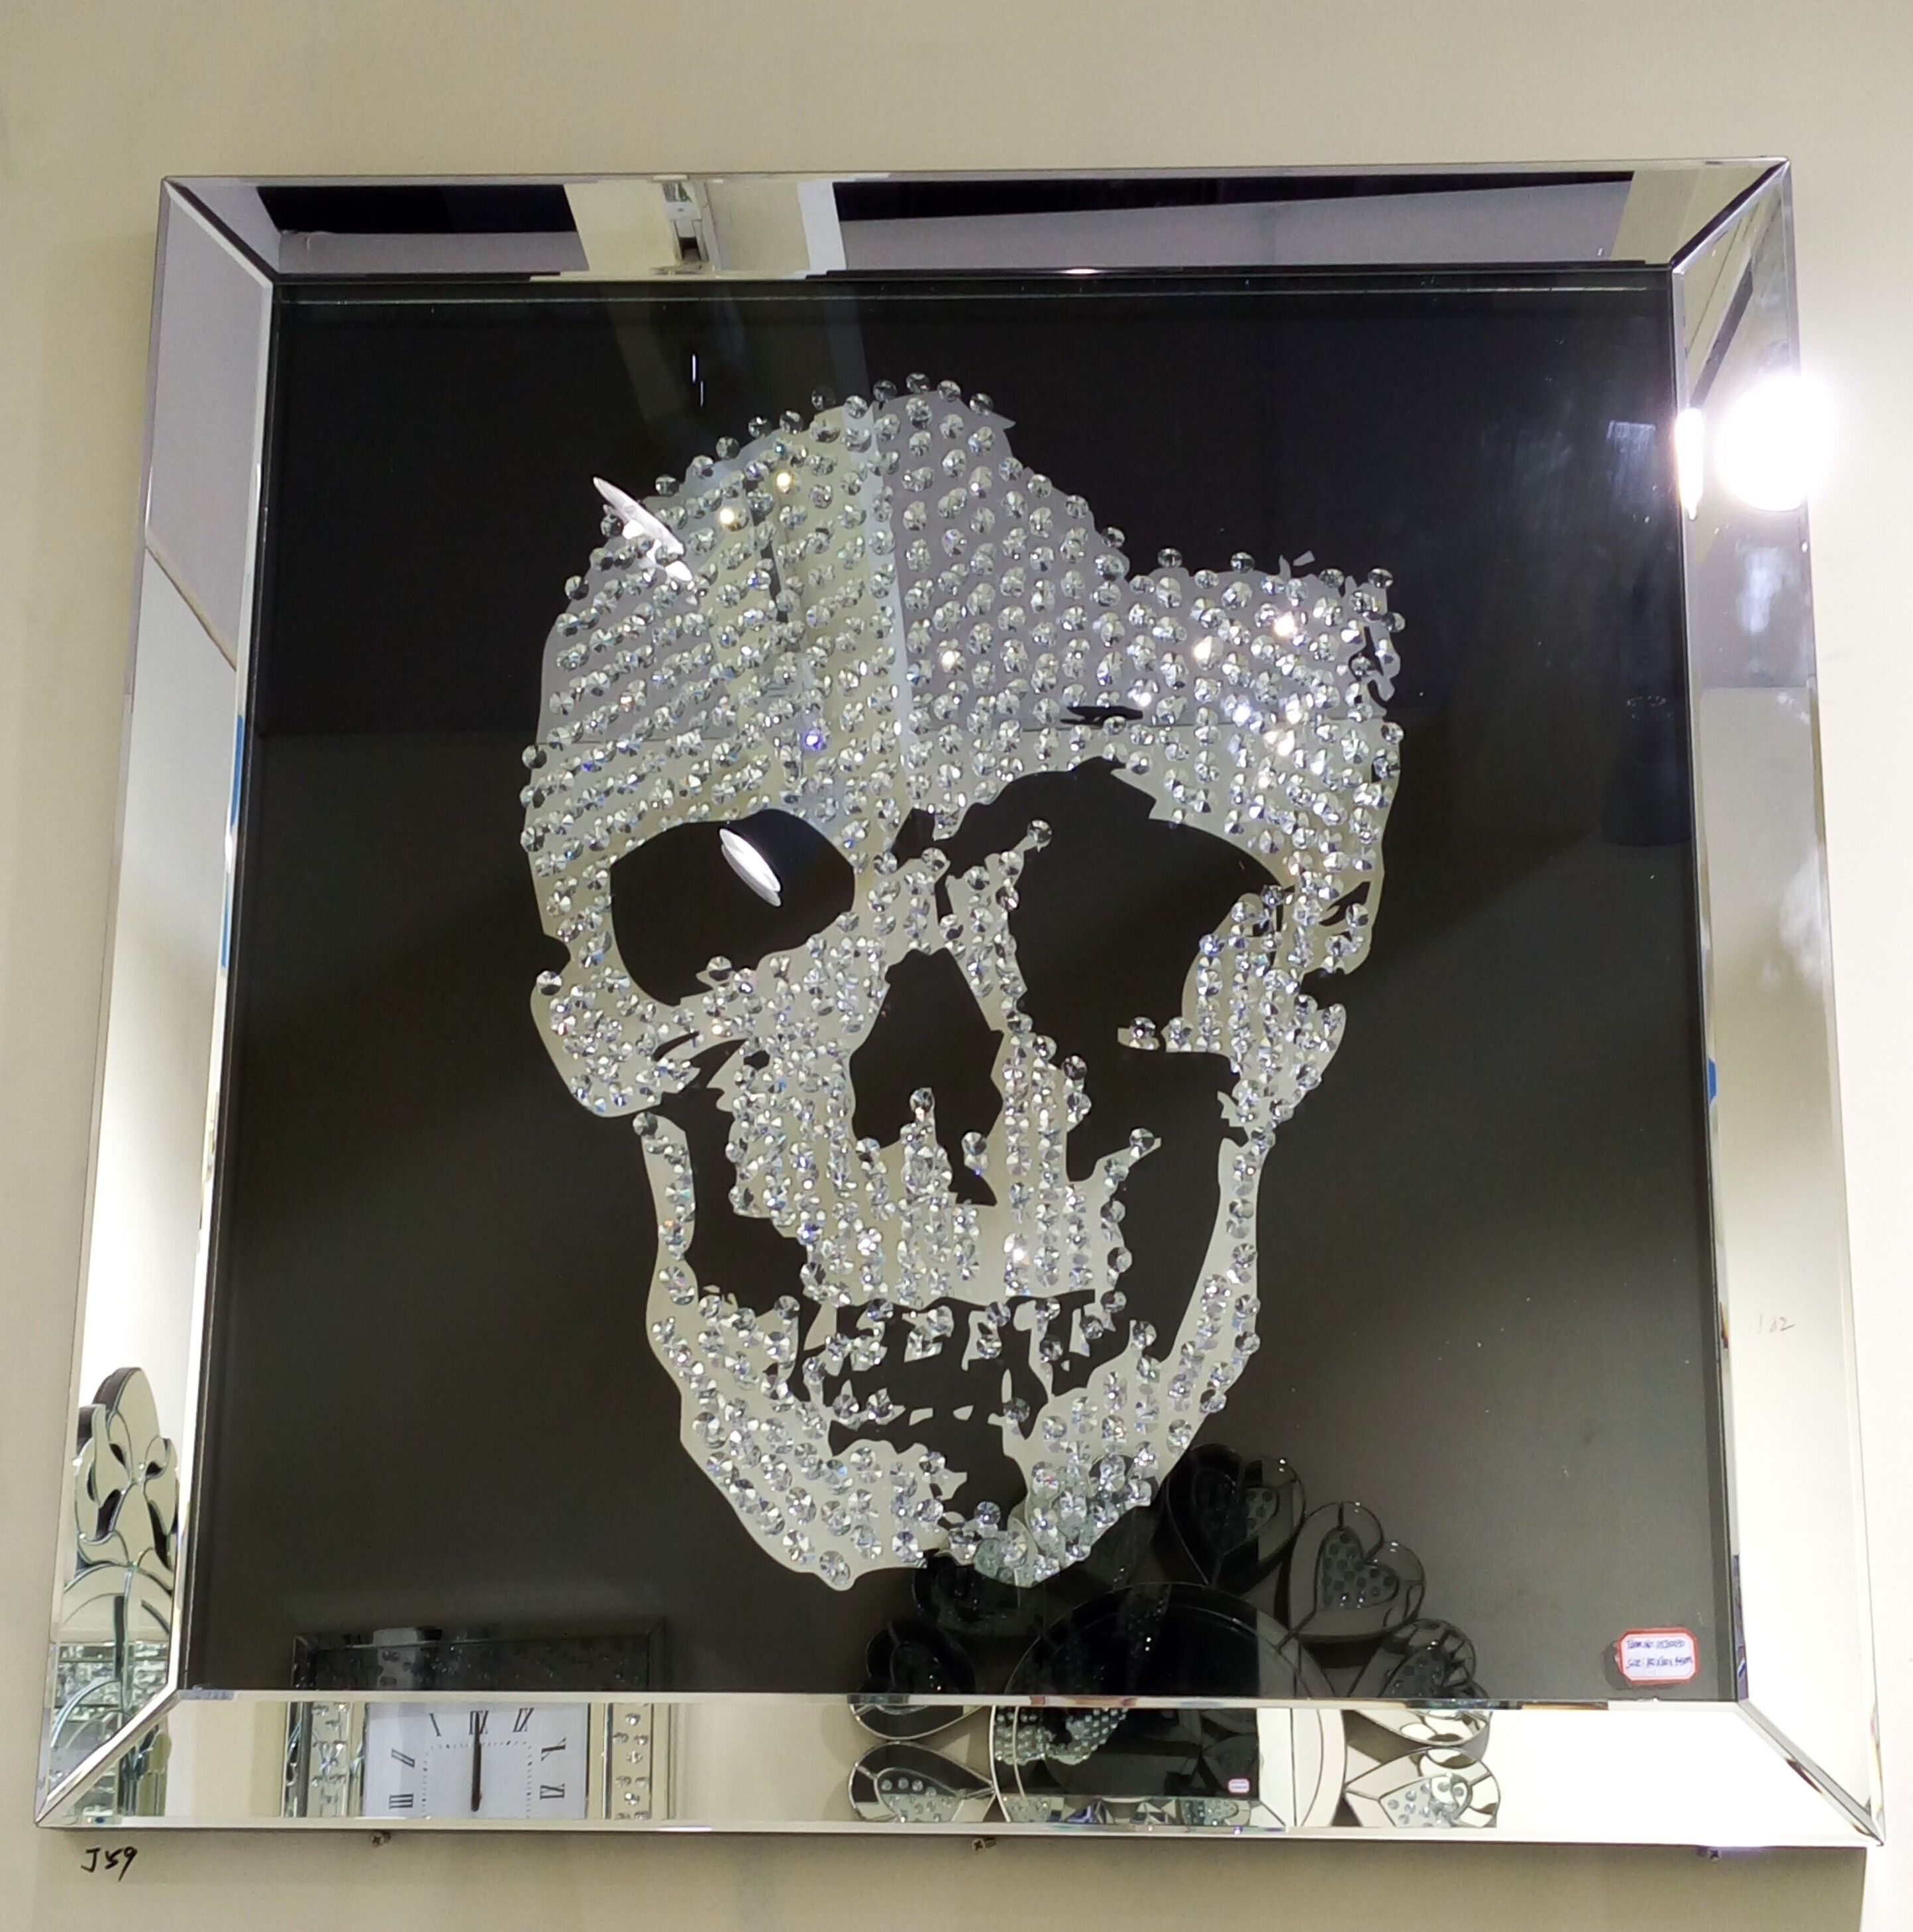 Swarovski Crystal Skull Wall Art With A Silver Mirrored